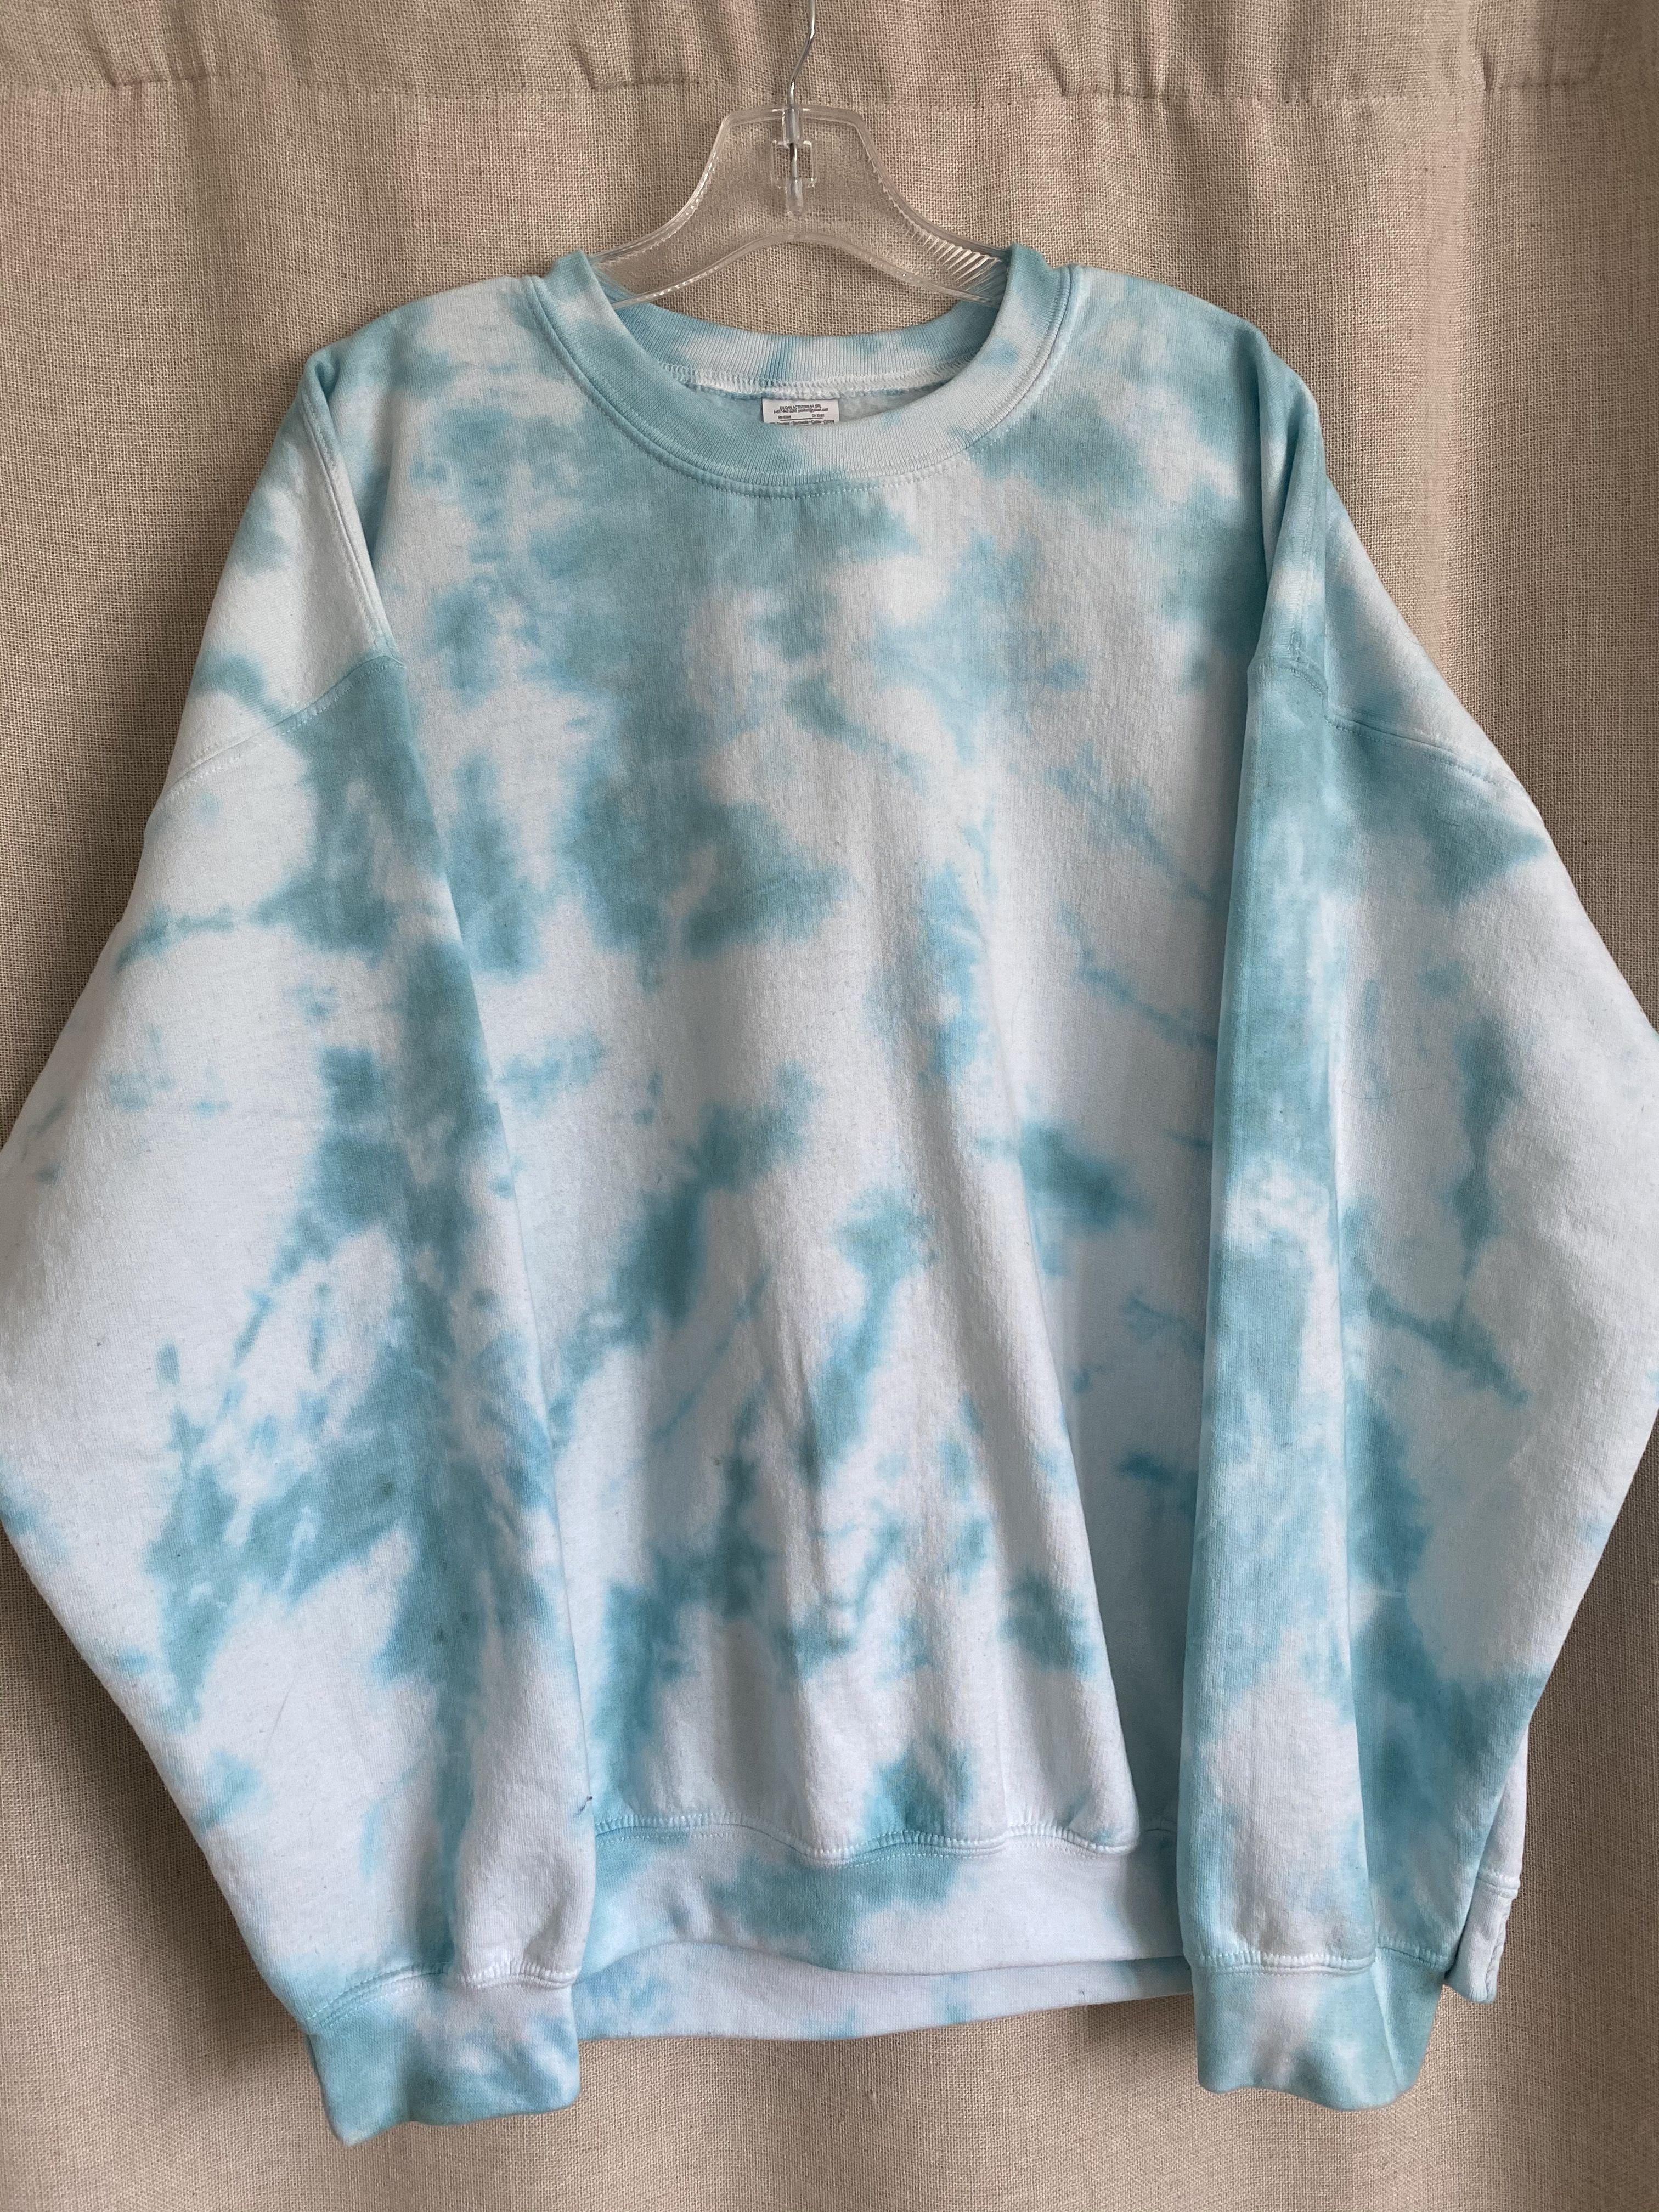 Oversized Vintage Tie Dye Crewneck Sweatshirts In Light Aqua Teal Blue Xl Tie Dye Outfits Tie Dye Tie Dye Crewneck Sweatshirts [ 4032 x 3024 Pixel ]